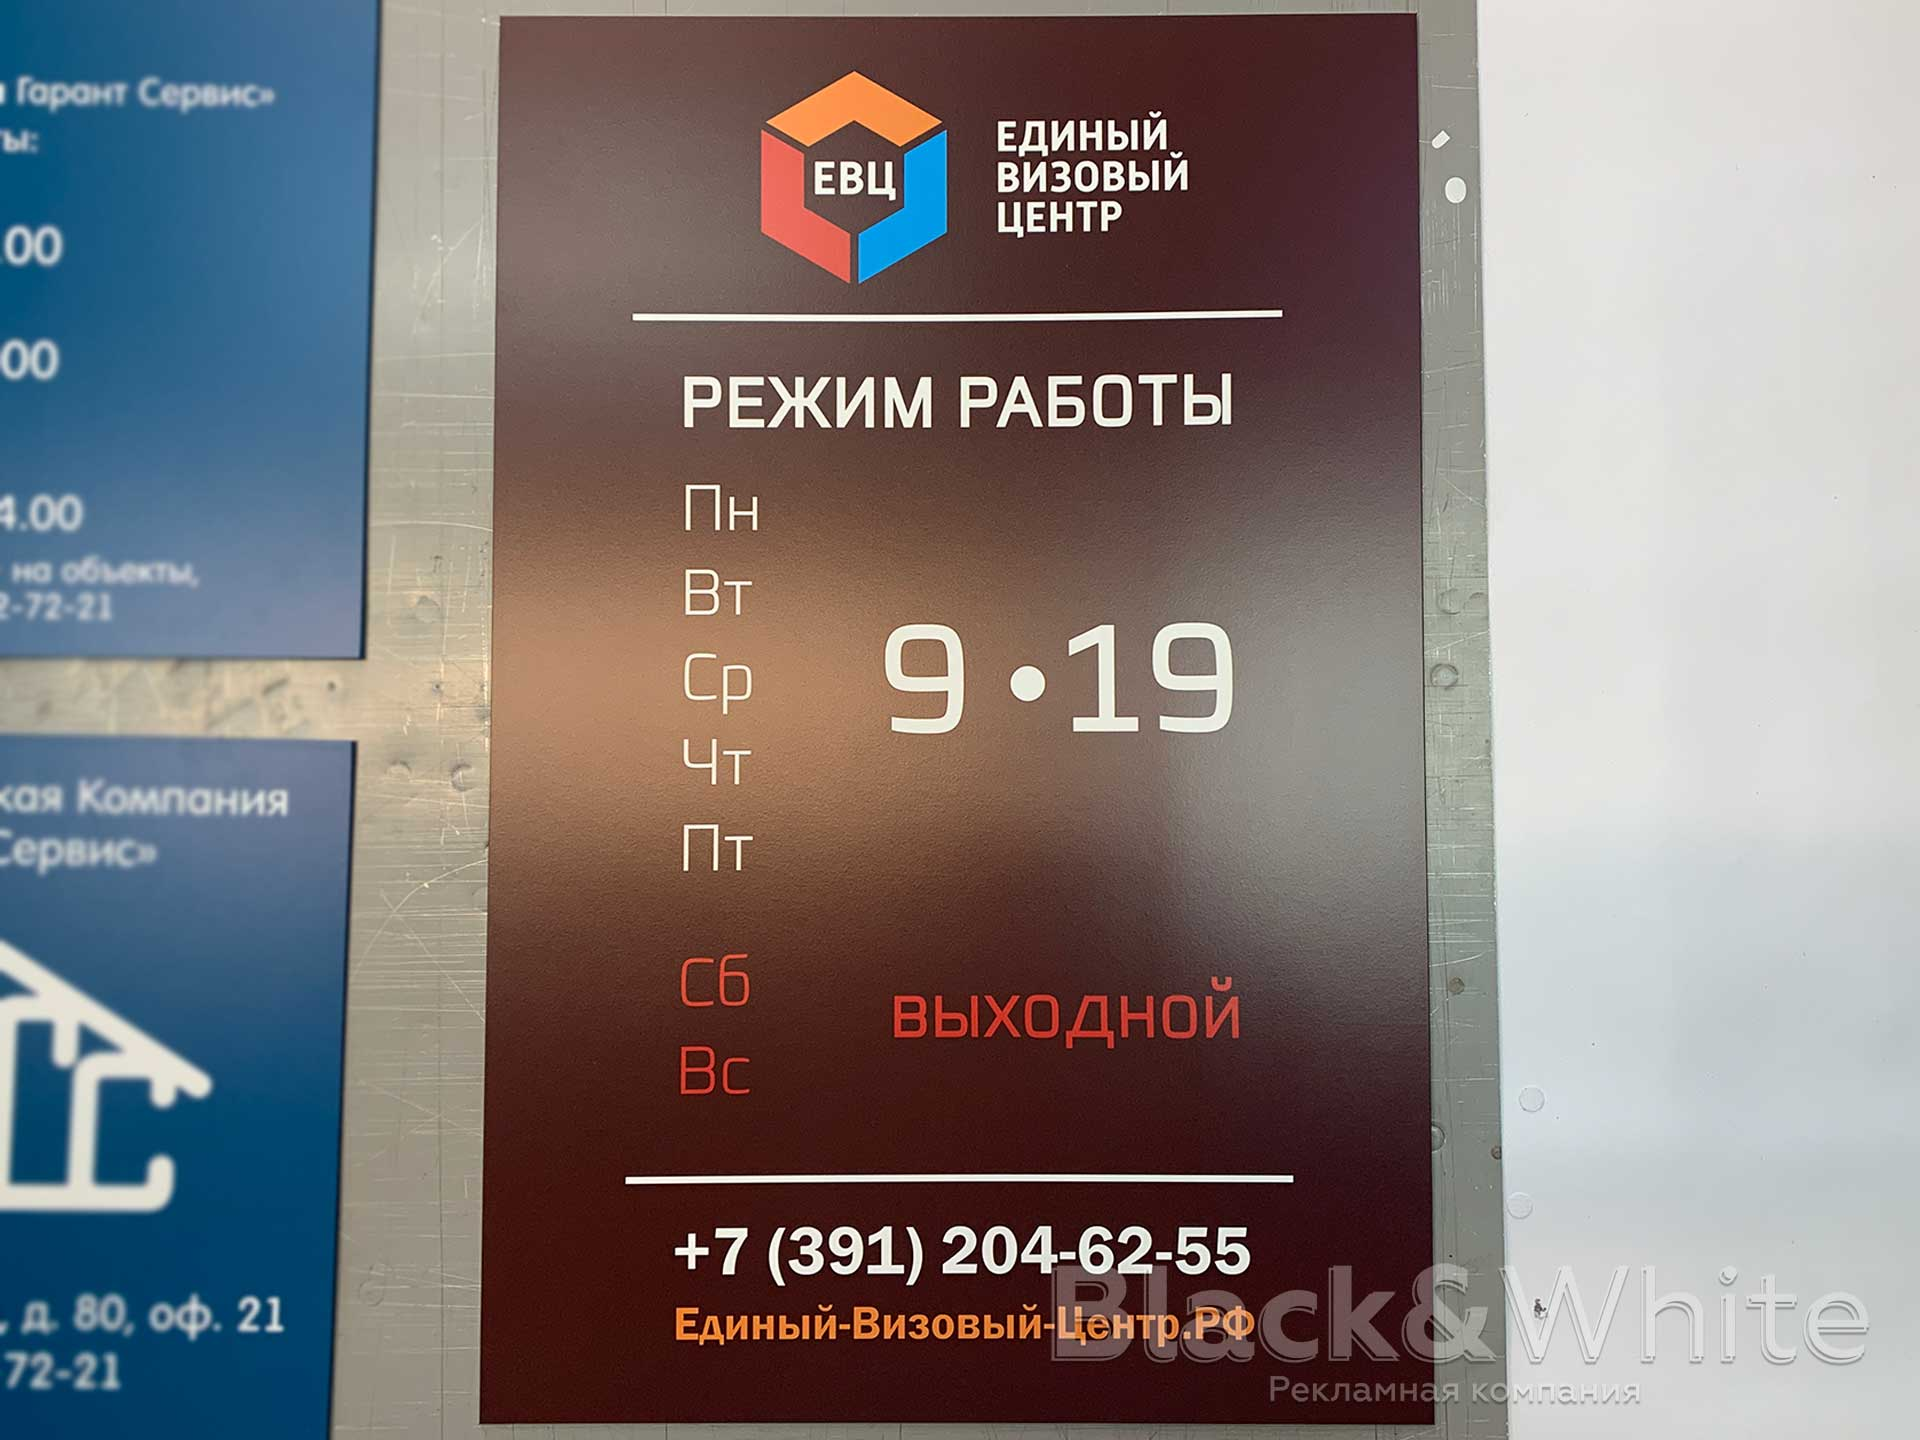 режим-работы-для-визового-центра-Красноярск.jpg